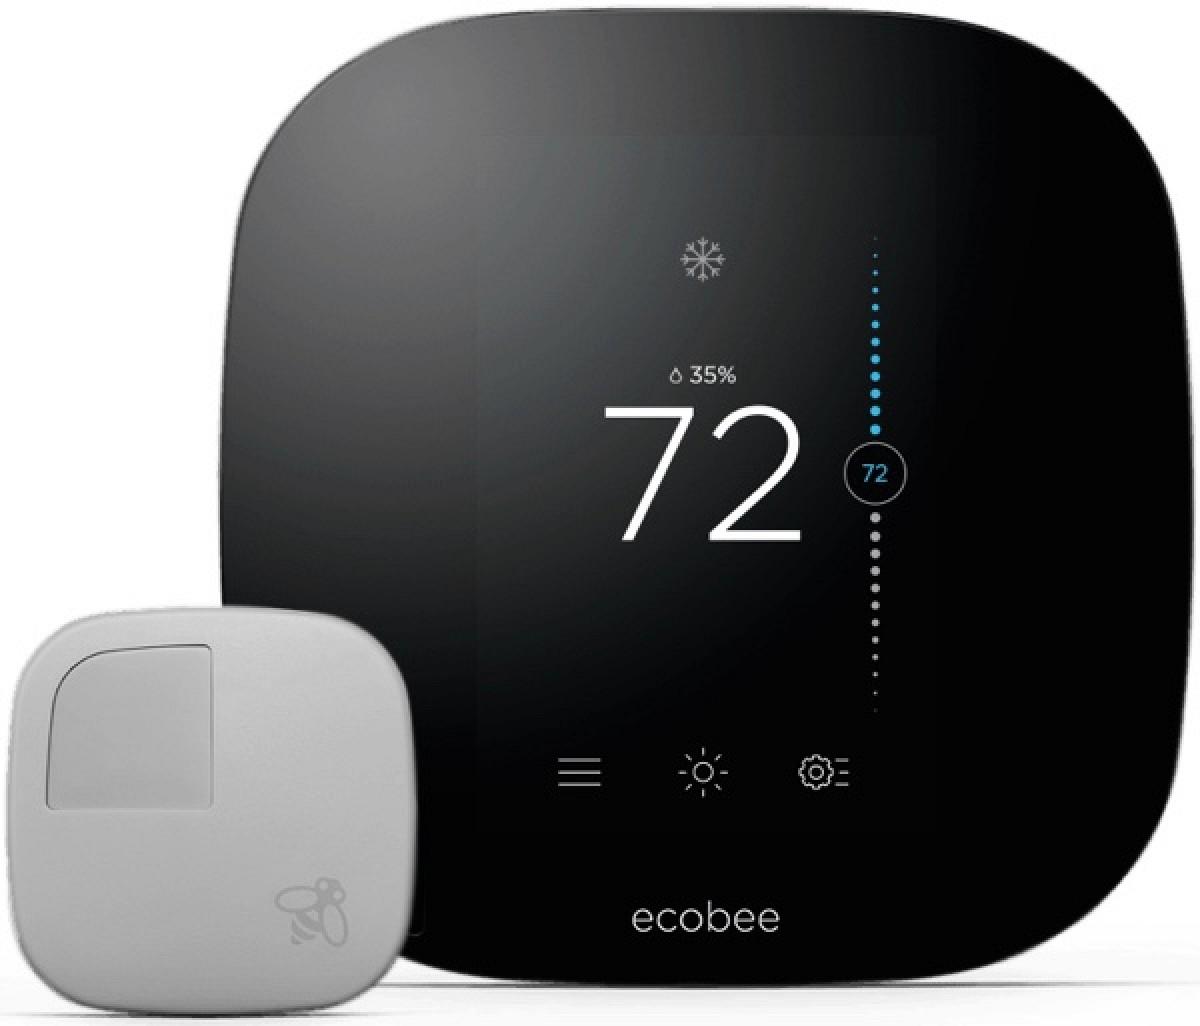 Ecobee And Insteon Announce New Homekit